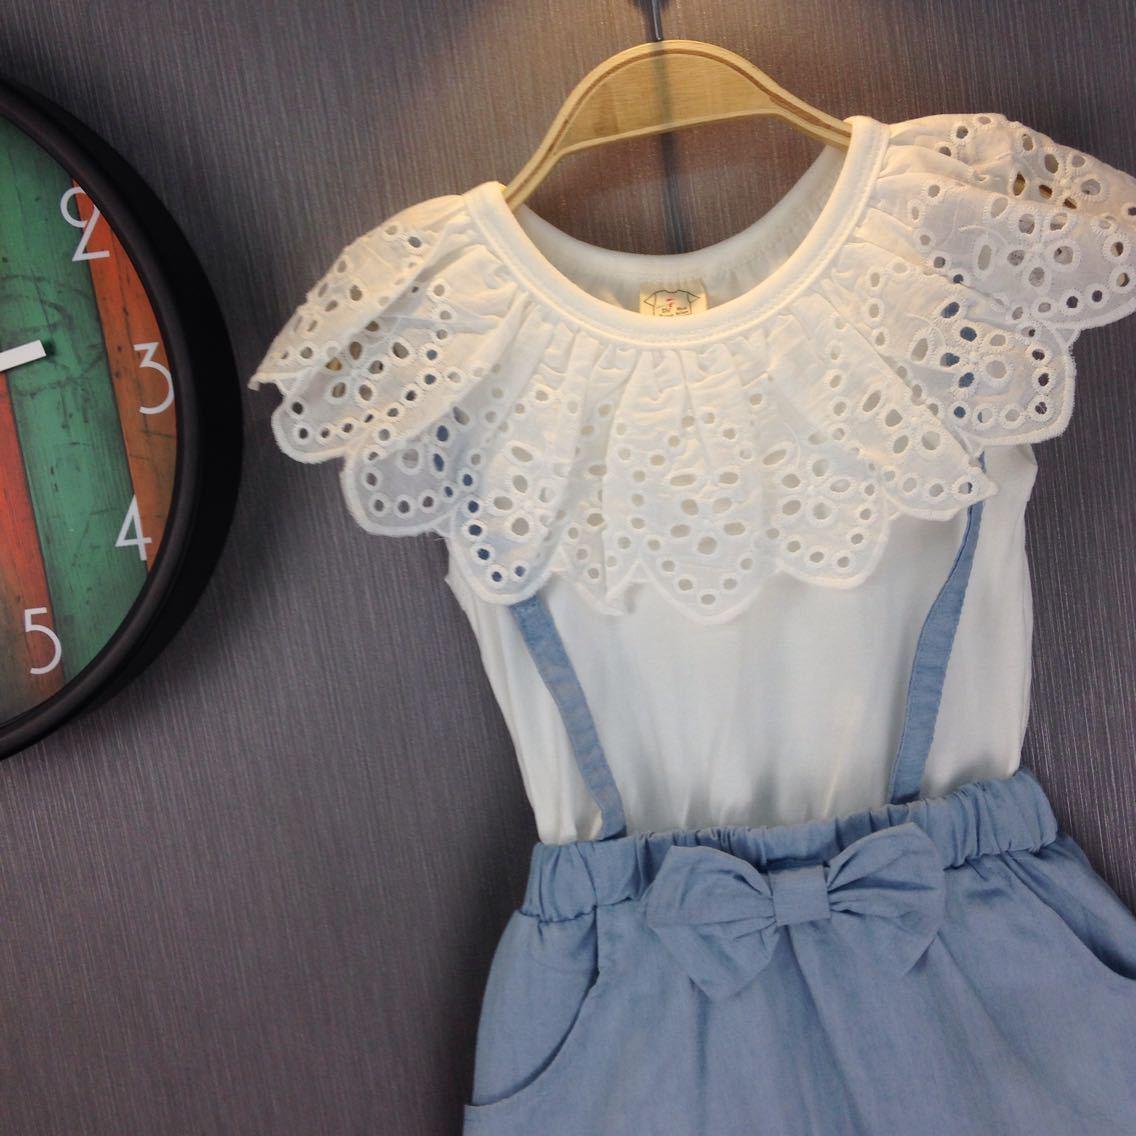 Tunika T-Shirt Blusen Shirt Tee Tops Pullover Strecken Schlank Sommer Damen Neu